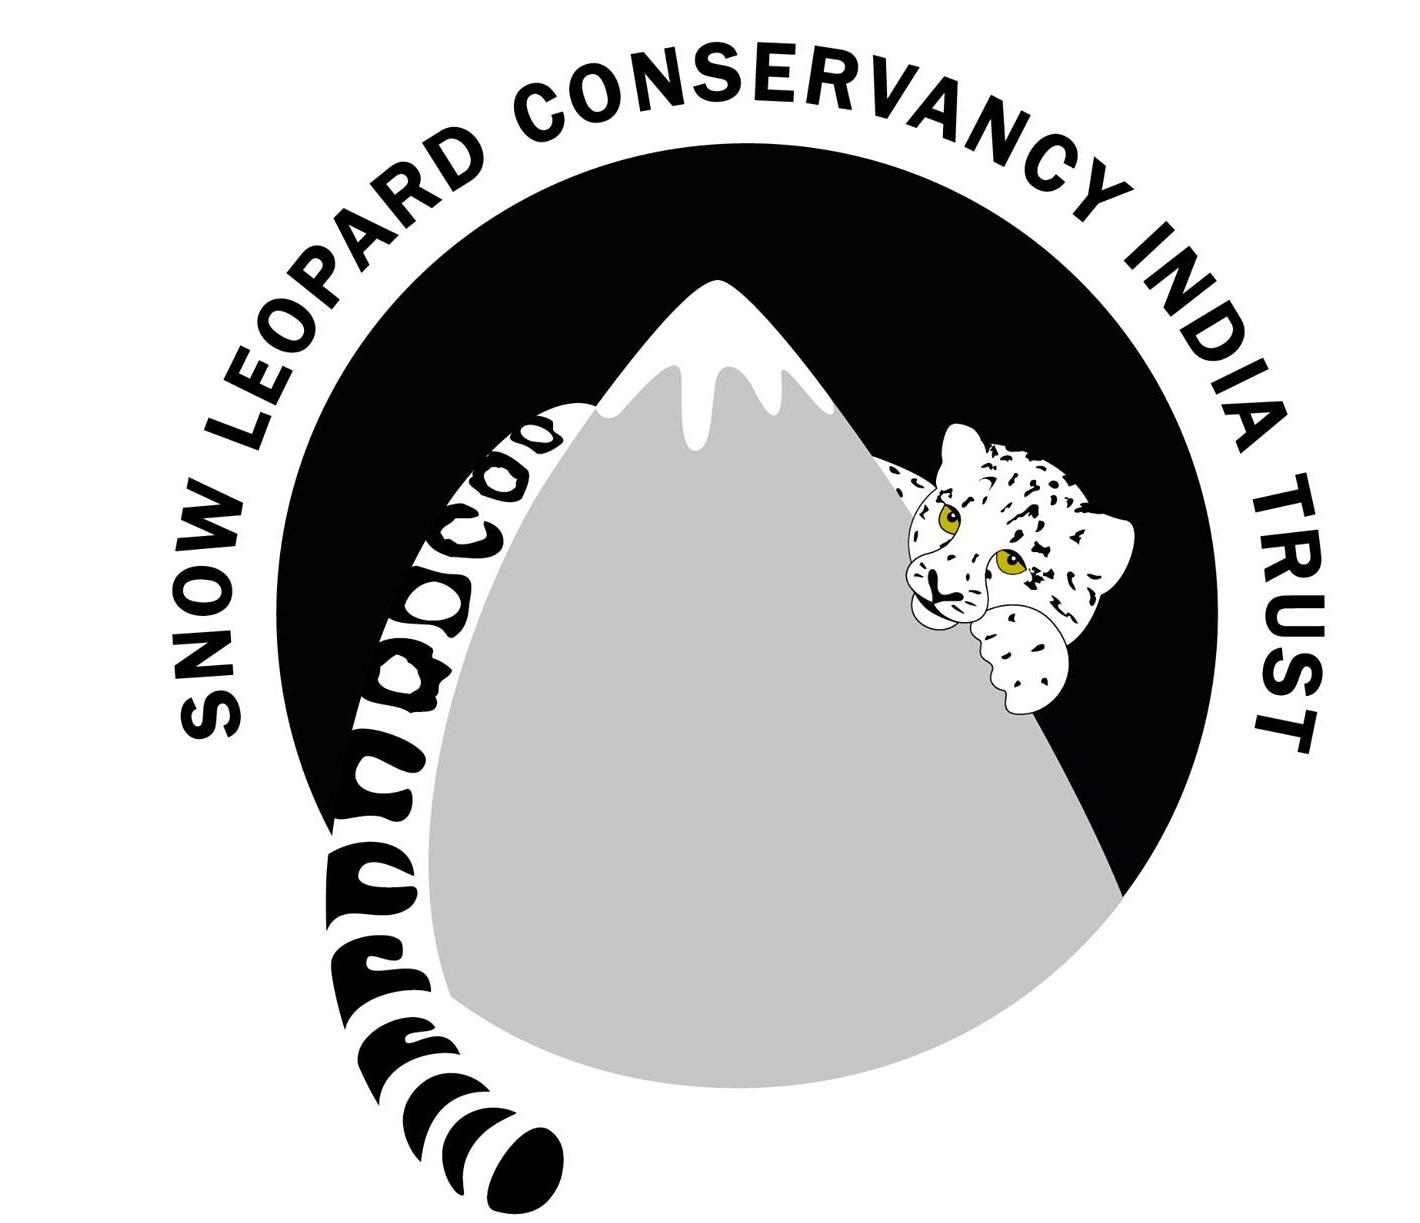 Snow Leopard Conservancy India Trust logo.jpg